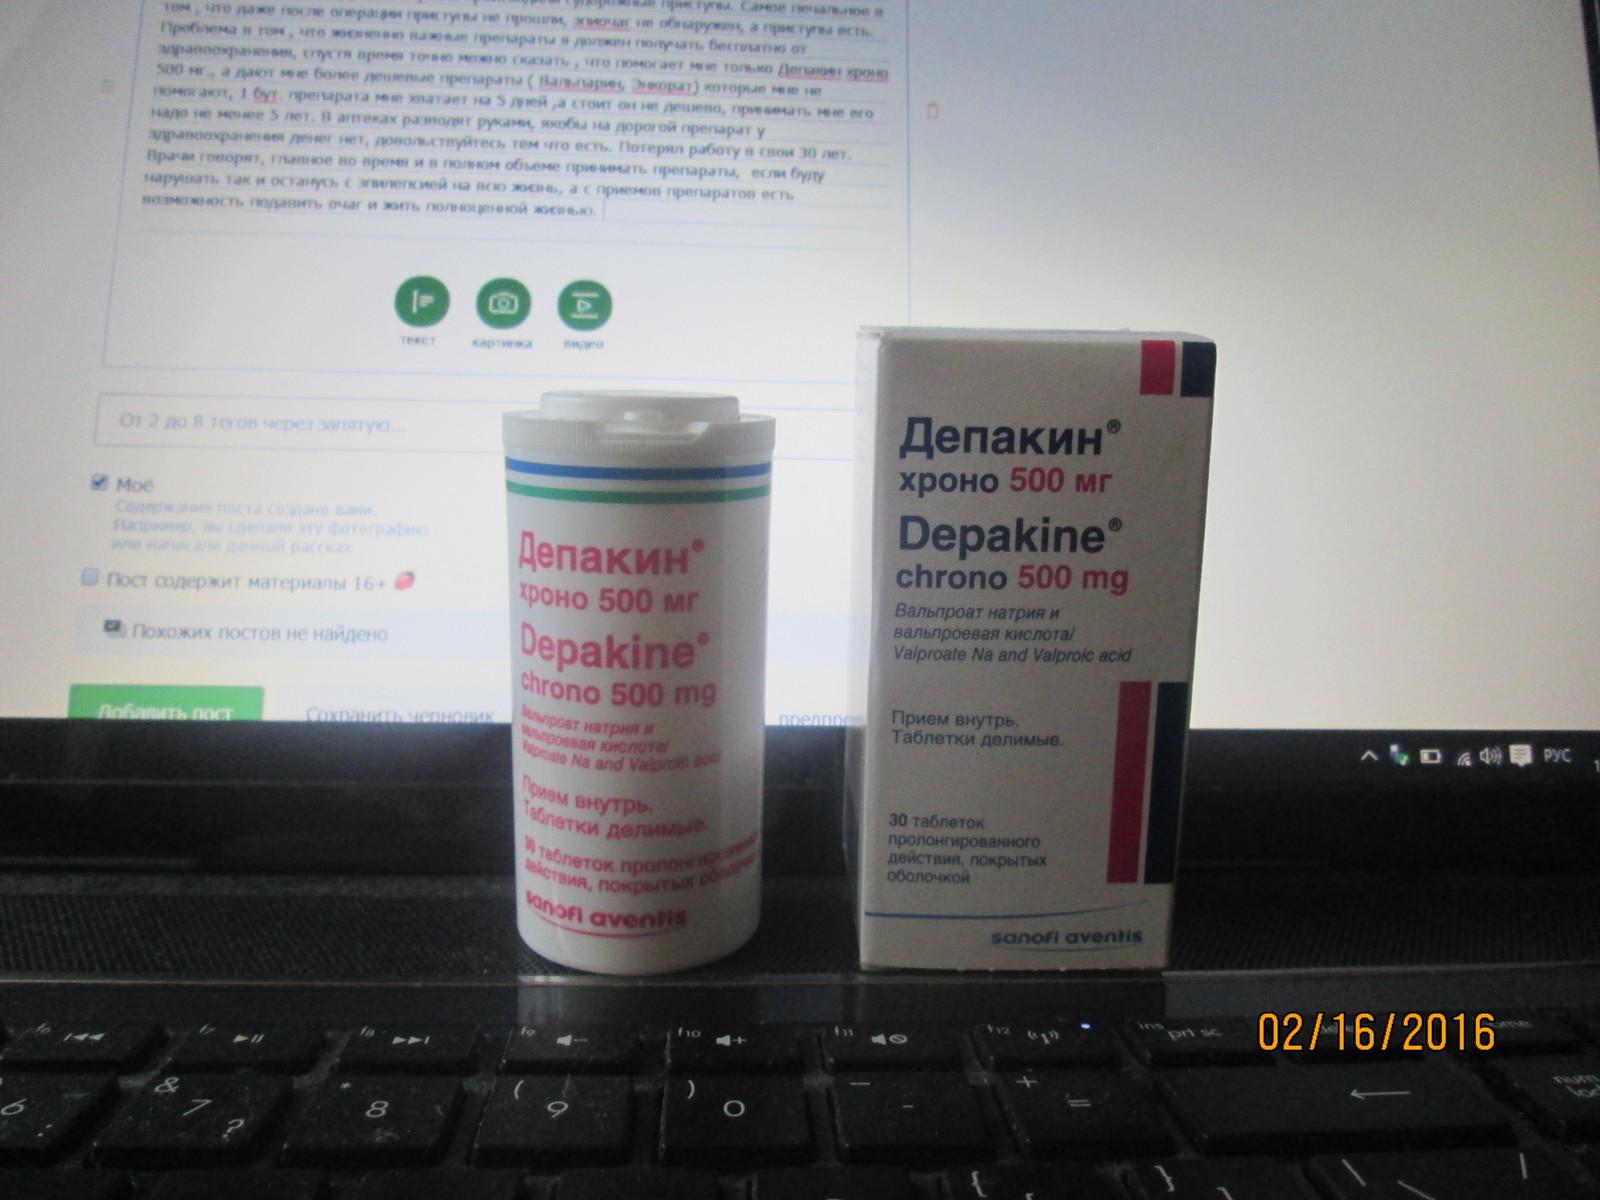 Купить депакин хроно 500 мг (ergenyl chrono 500 mg) за 80 евро в.